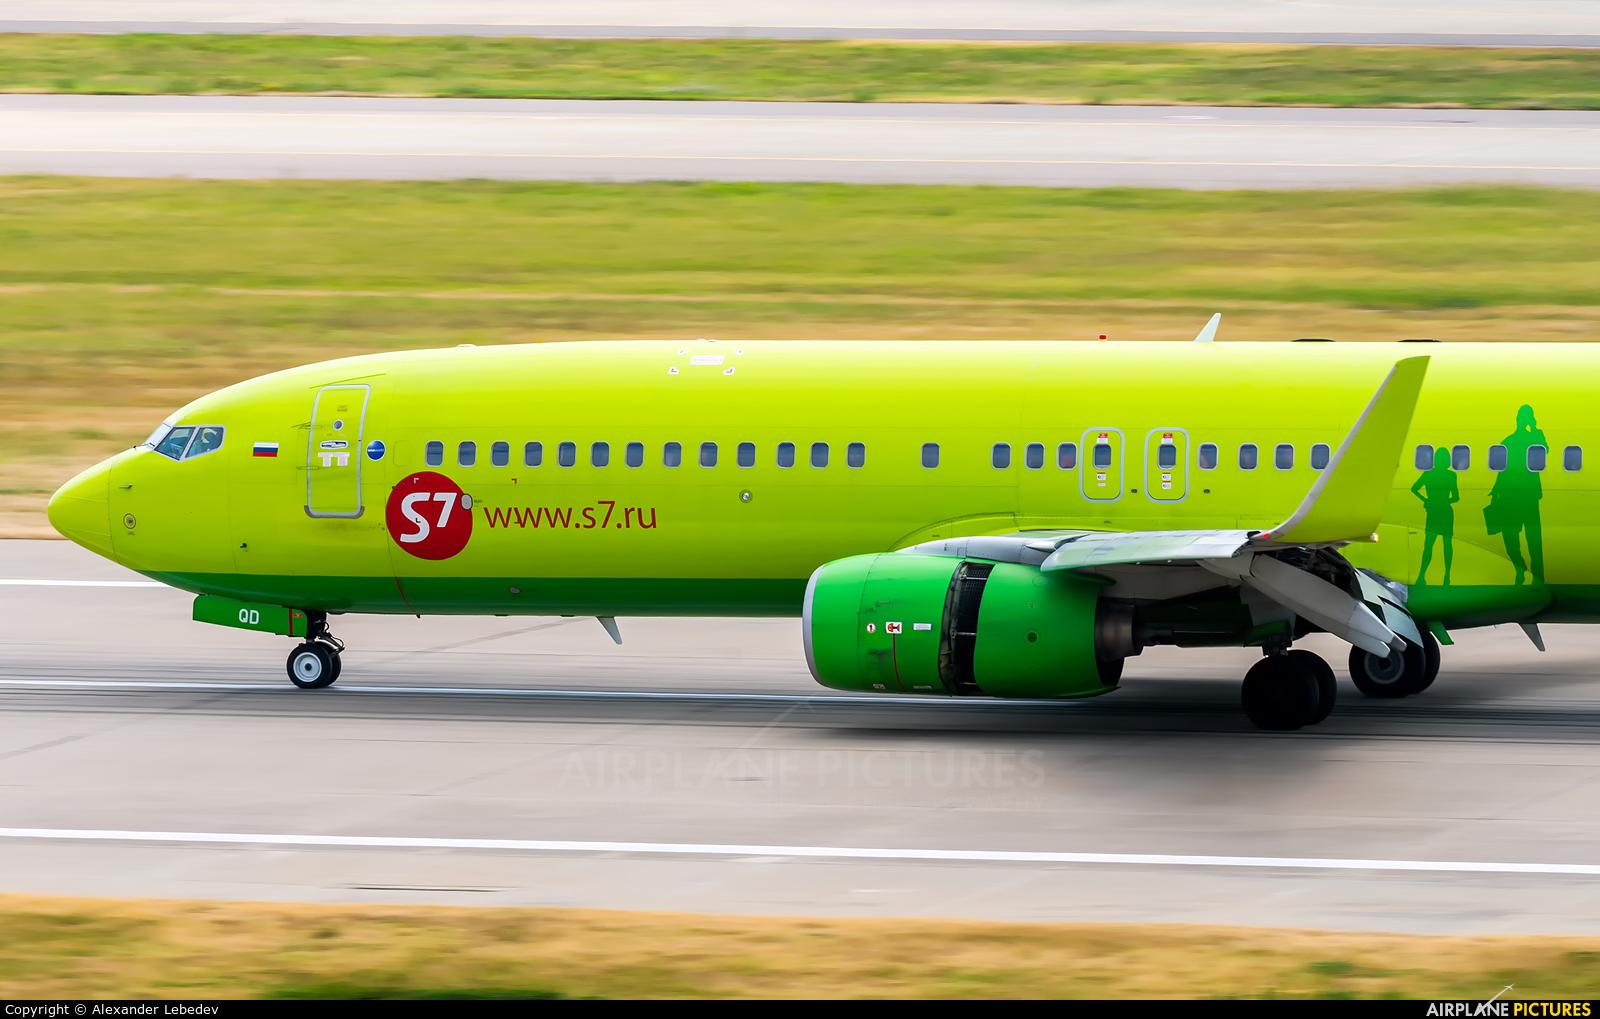 S7 Airlines VP-BQD aircraft at Sochi Intl